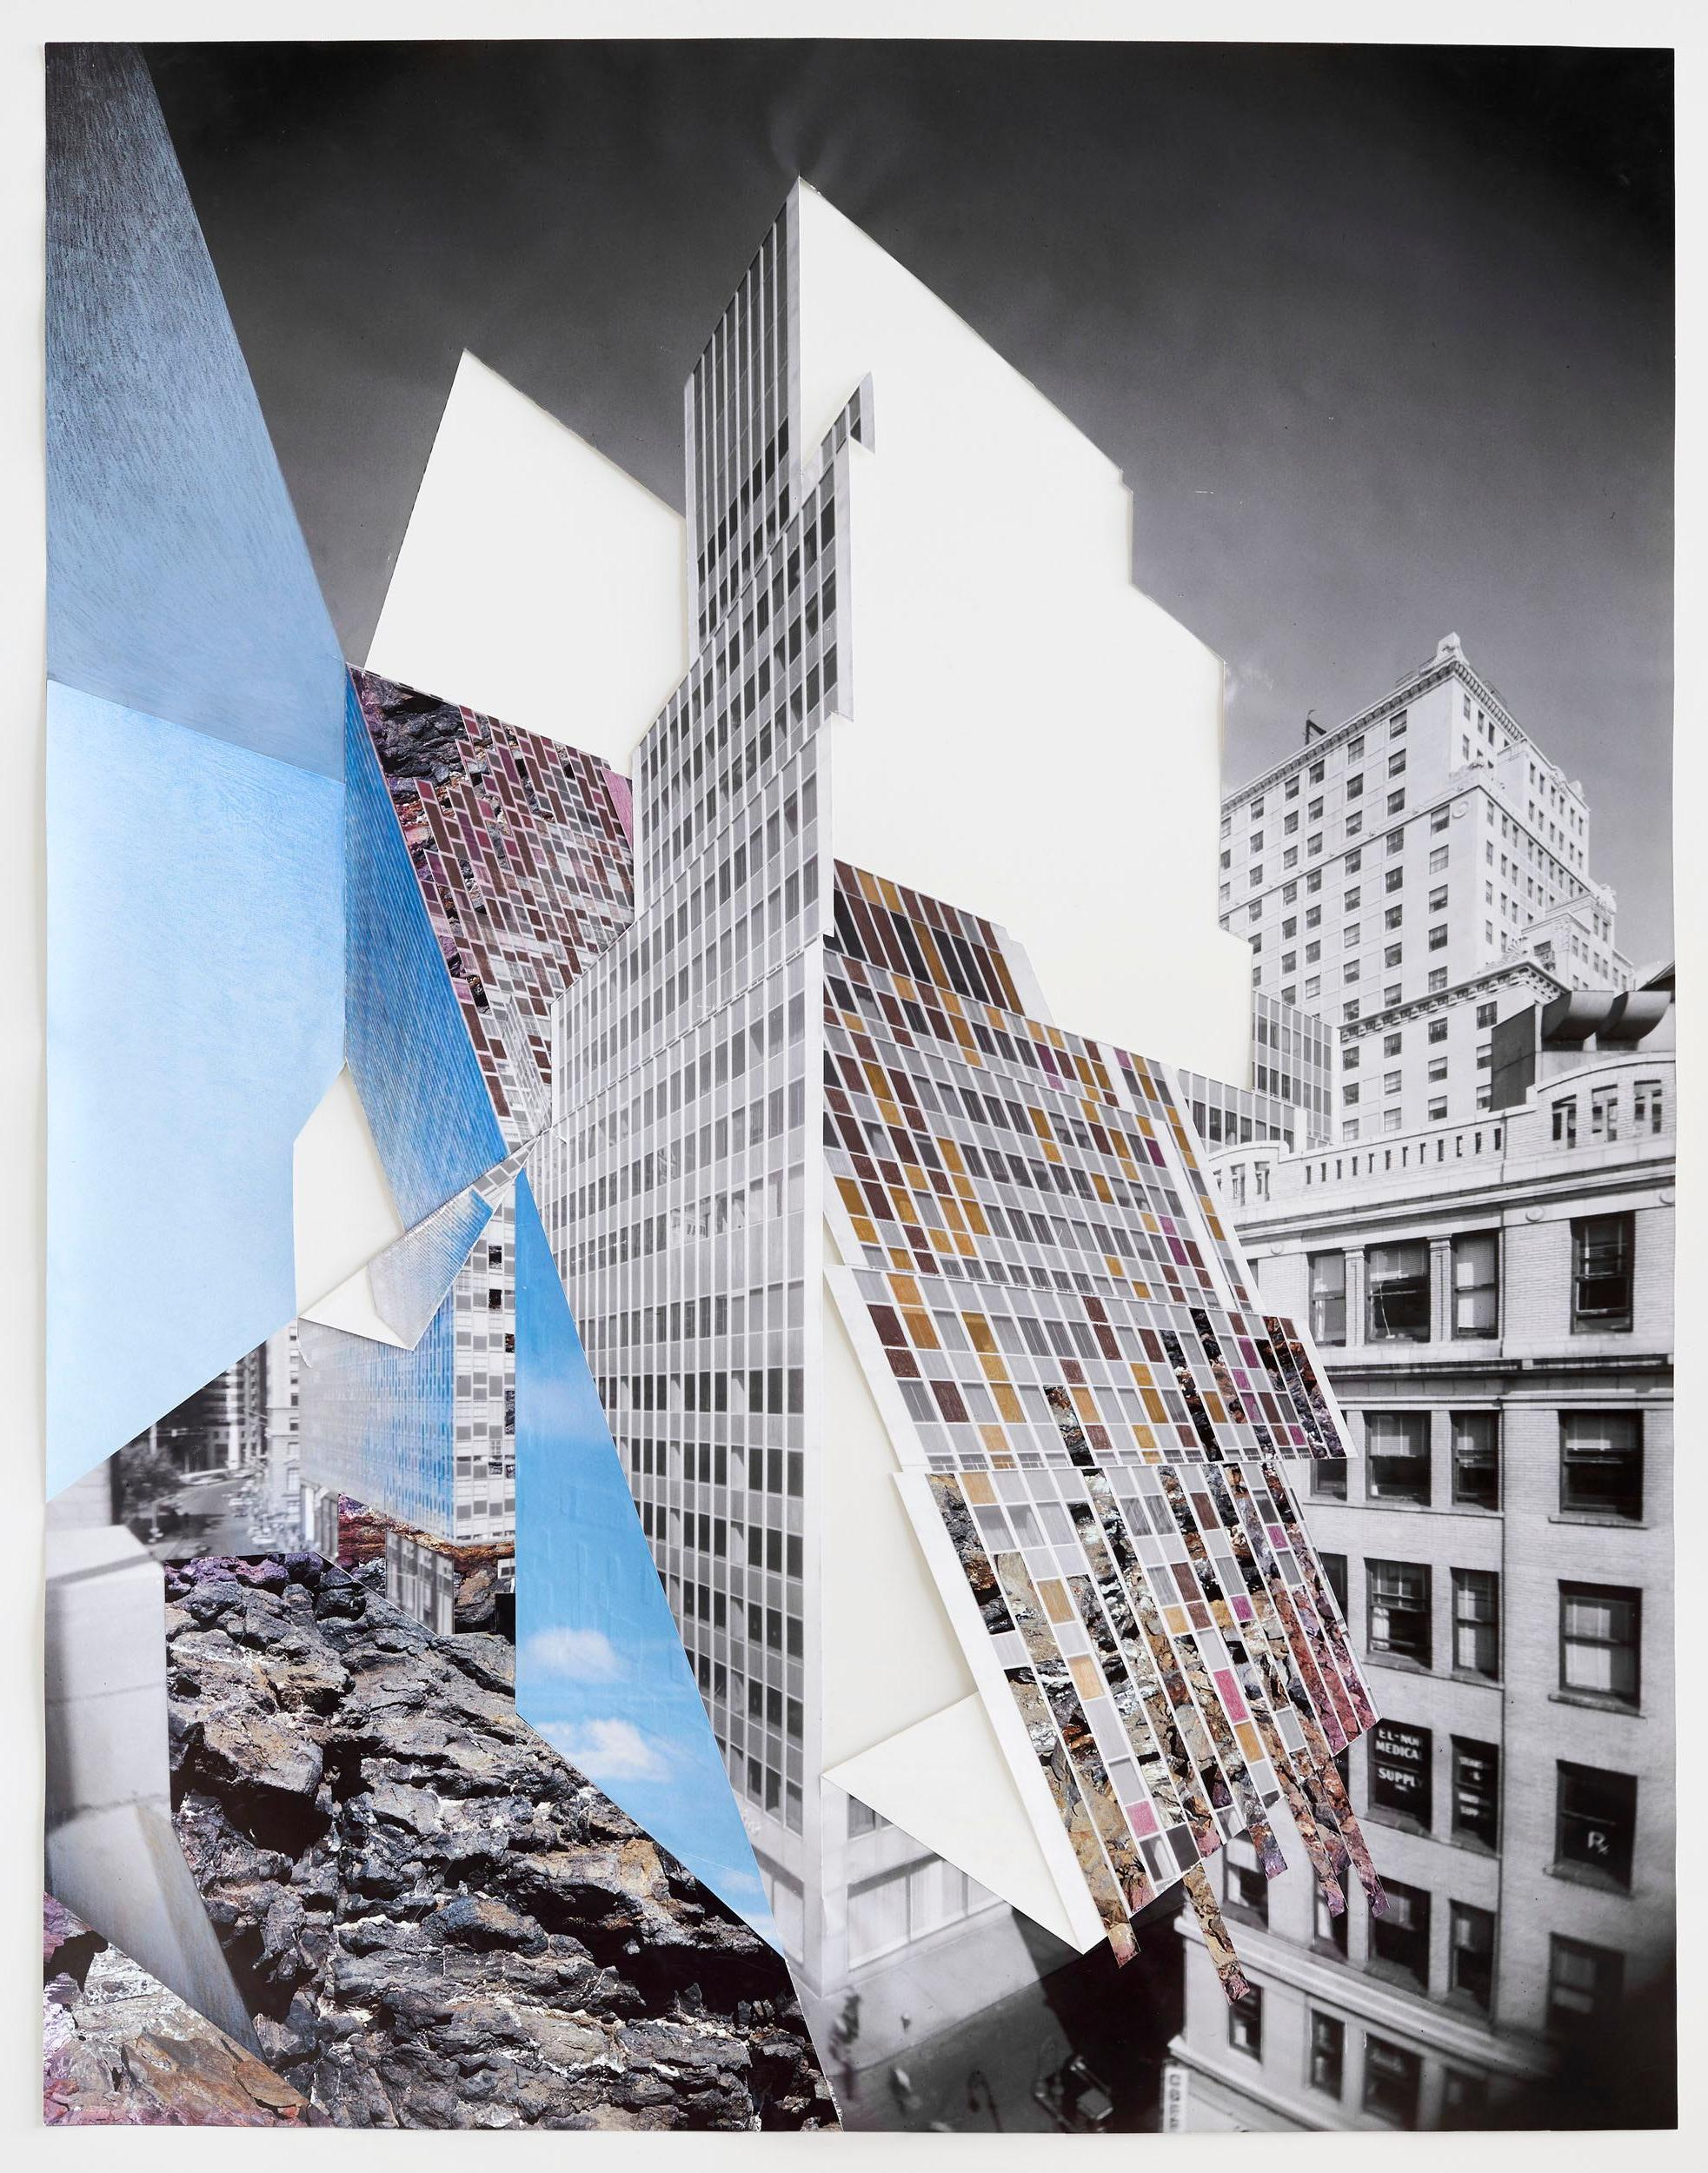 Slide, New York City, Architecture, Whitewall Street